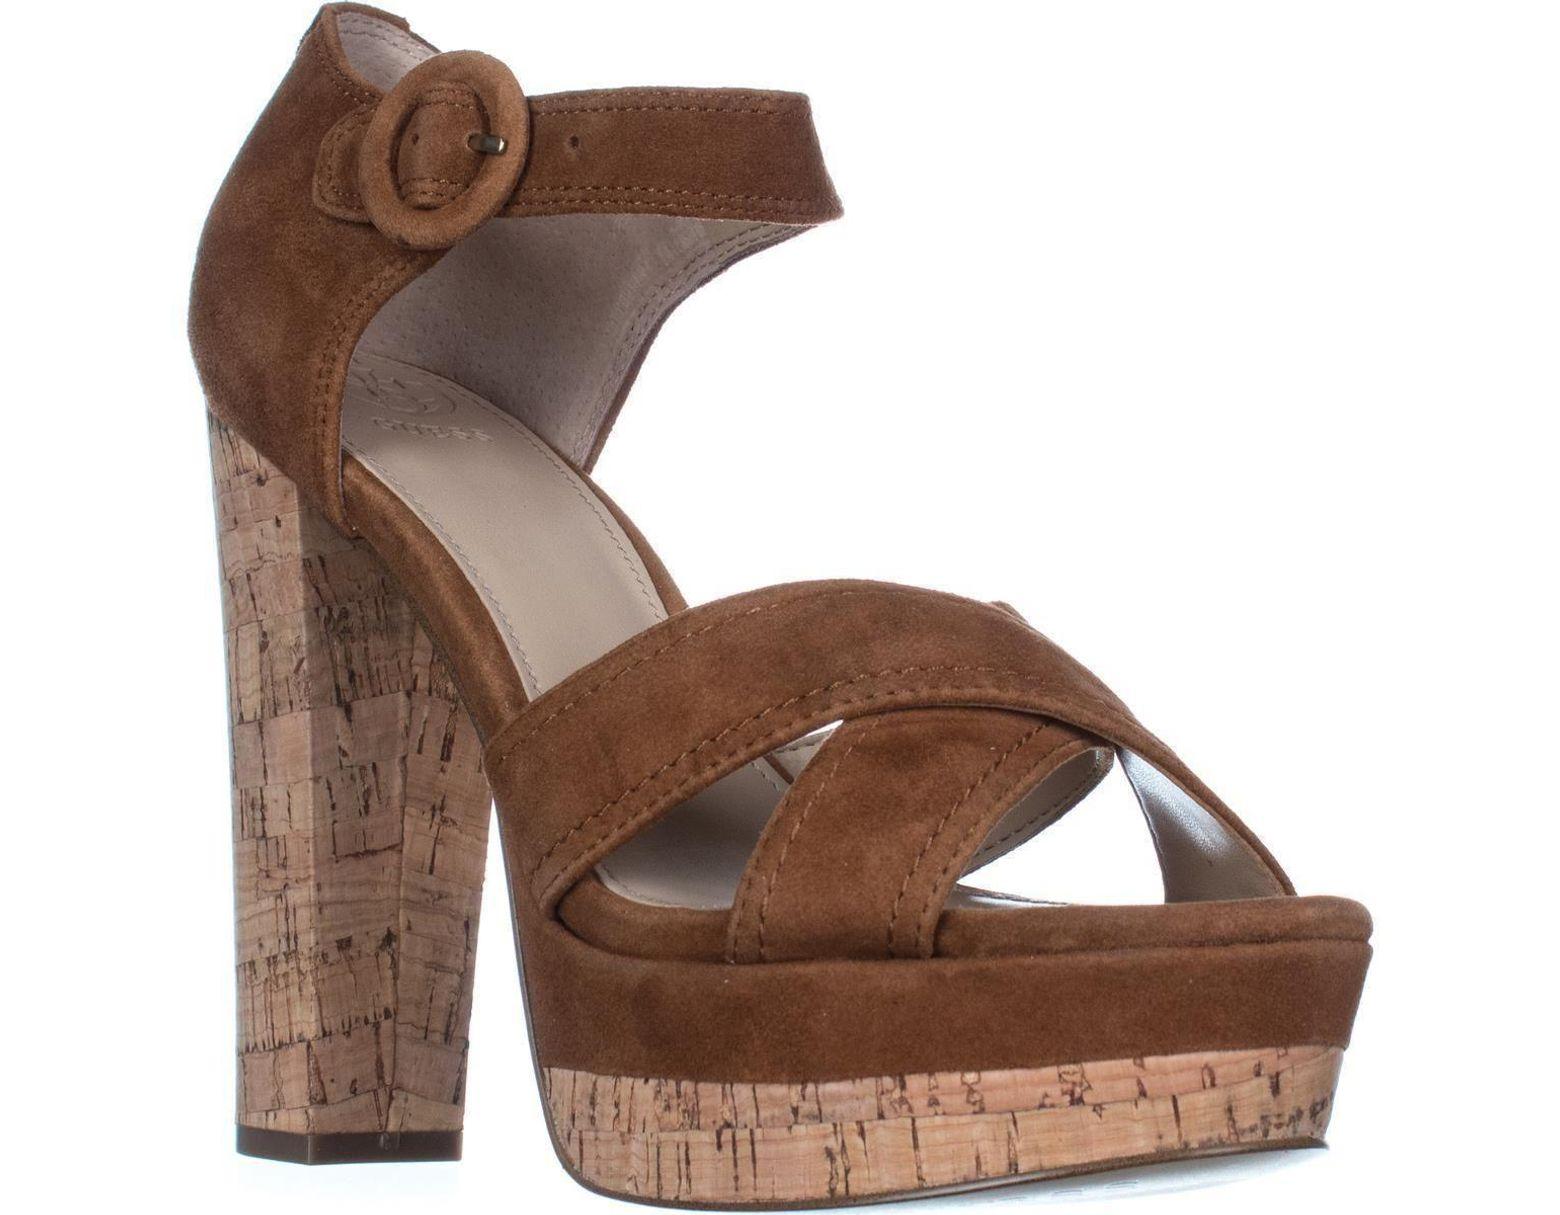 08b6ecb841eaa Women's Natural Parris Platform Ankle Strap Sandals